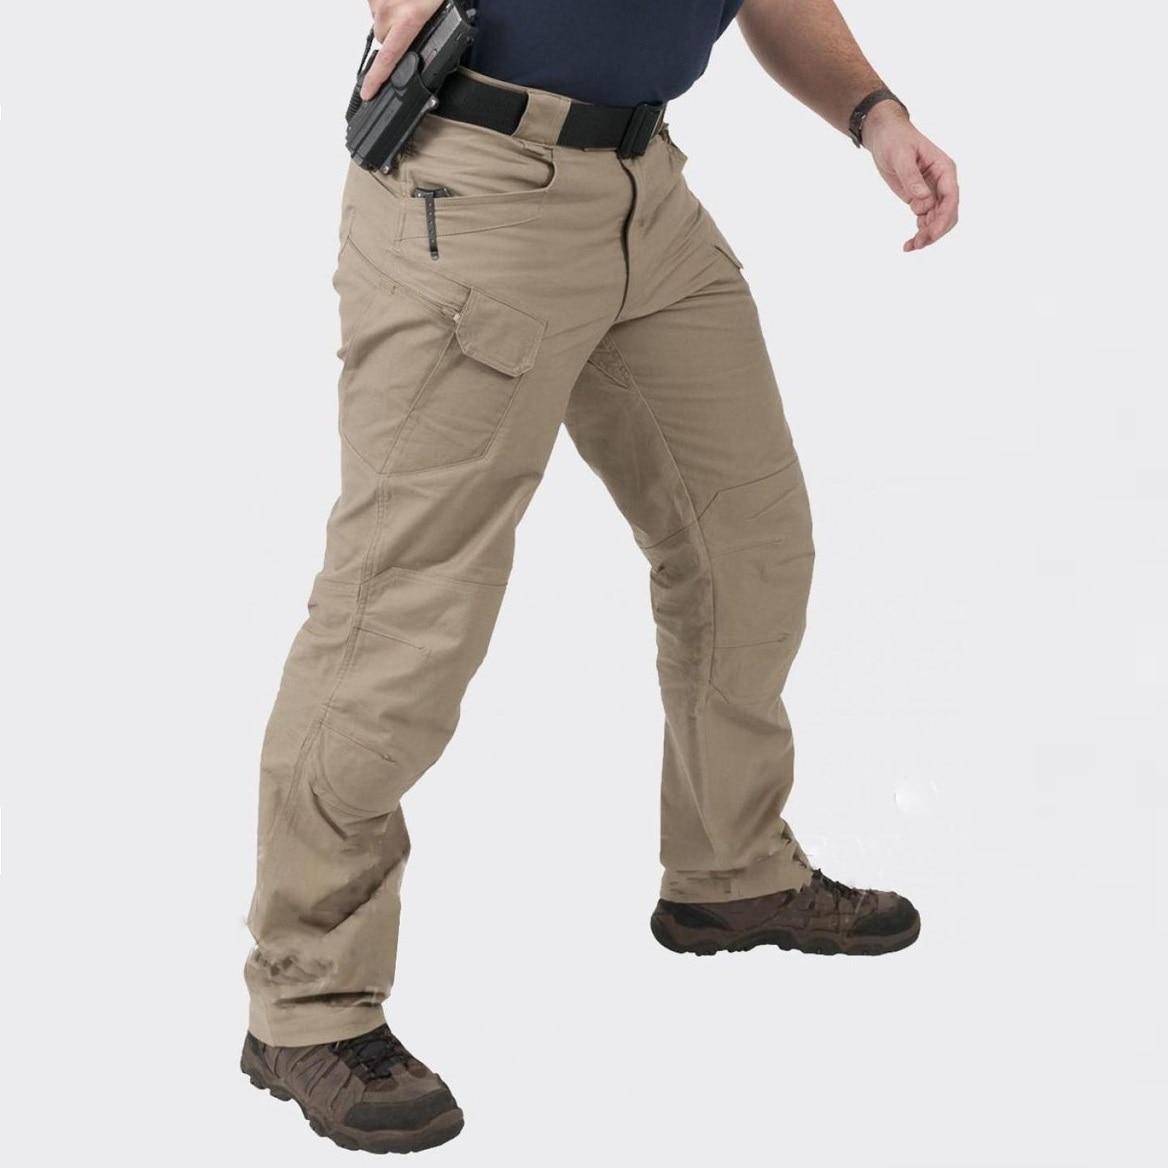 Popular Elastic Waist Cargo Pants-Buy Cheap Elastic Waist Cargo ...